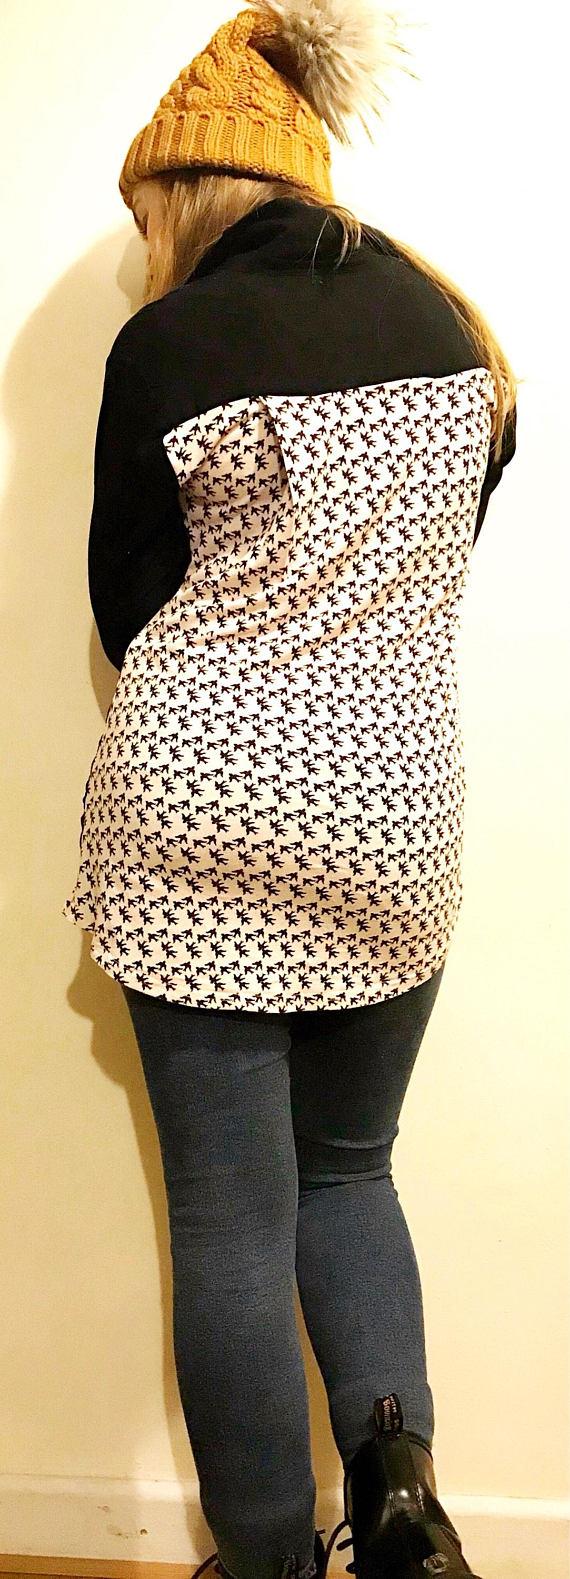 Bird Print Shirt - My Fashion Faux Pas